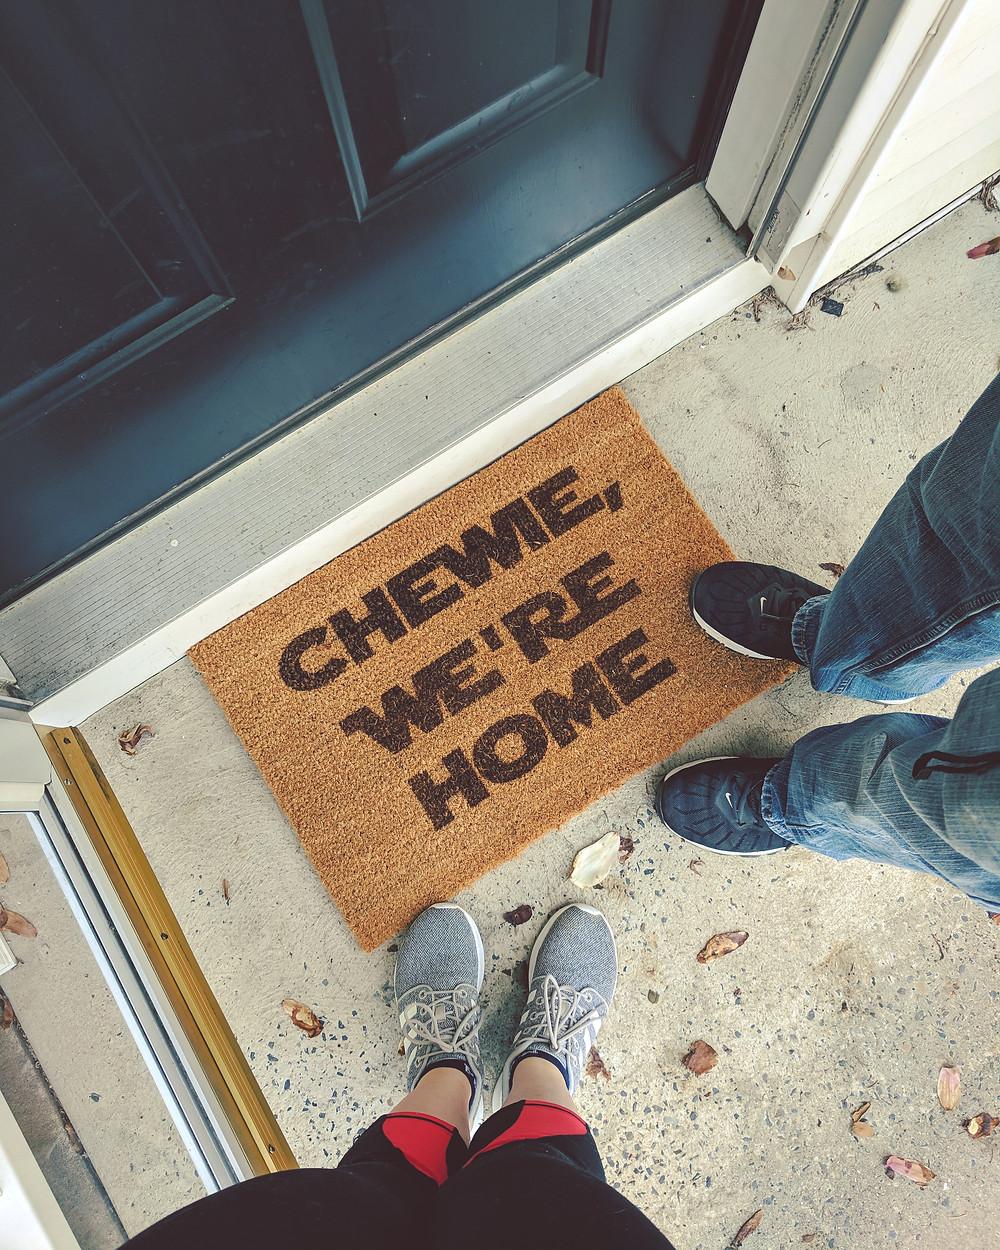 Honey, we're home - amanda macgregor - joseph centineo - food allergy lifestyle - home buying